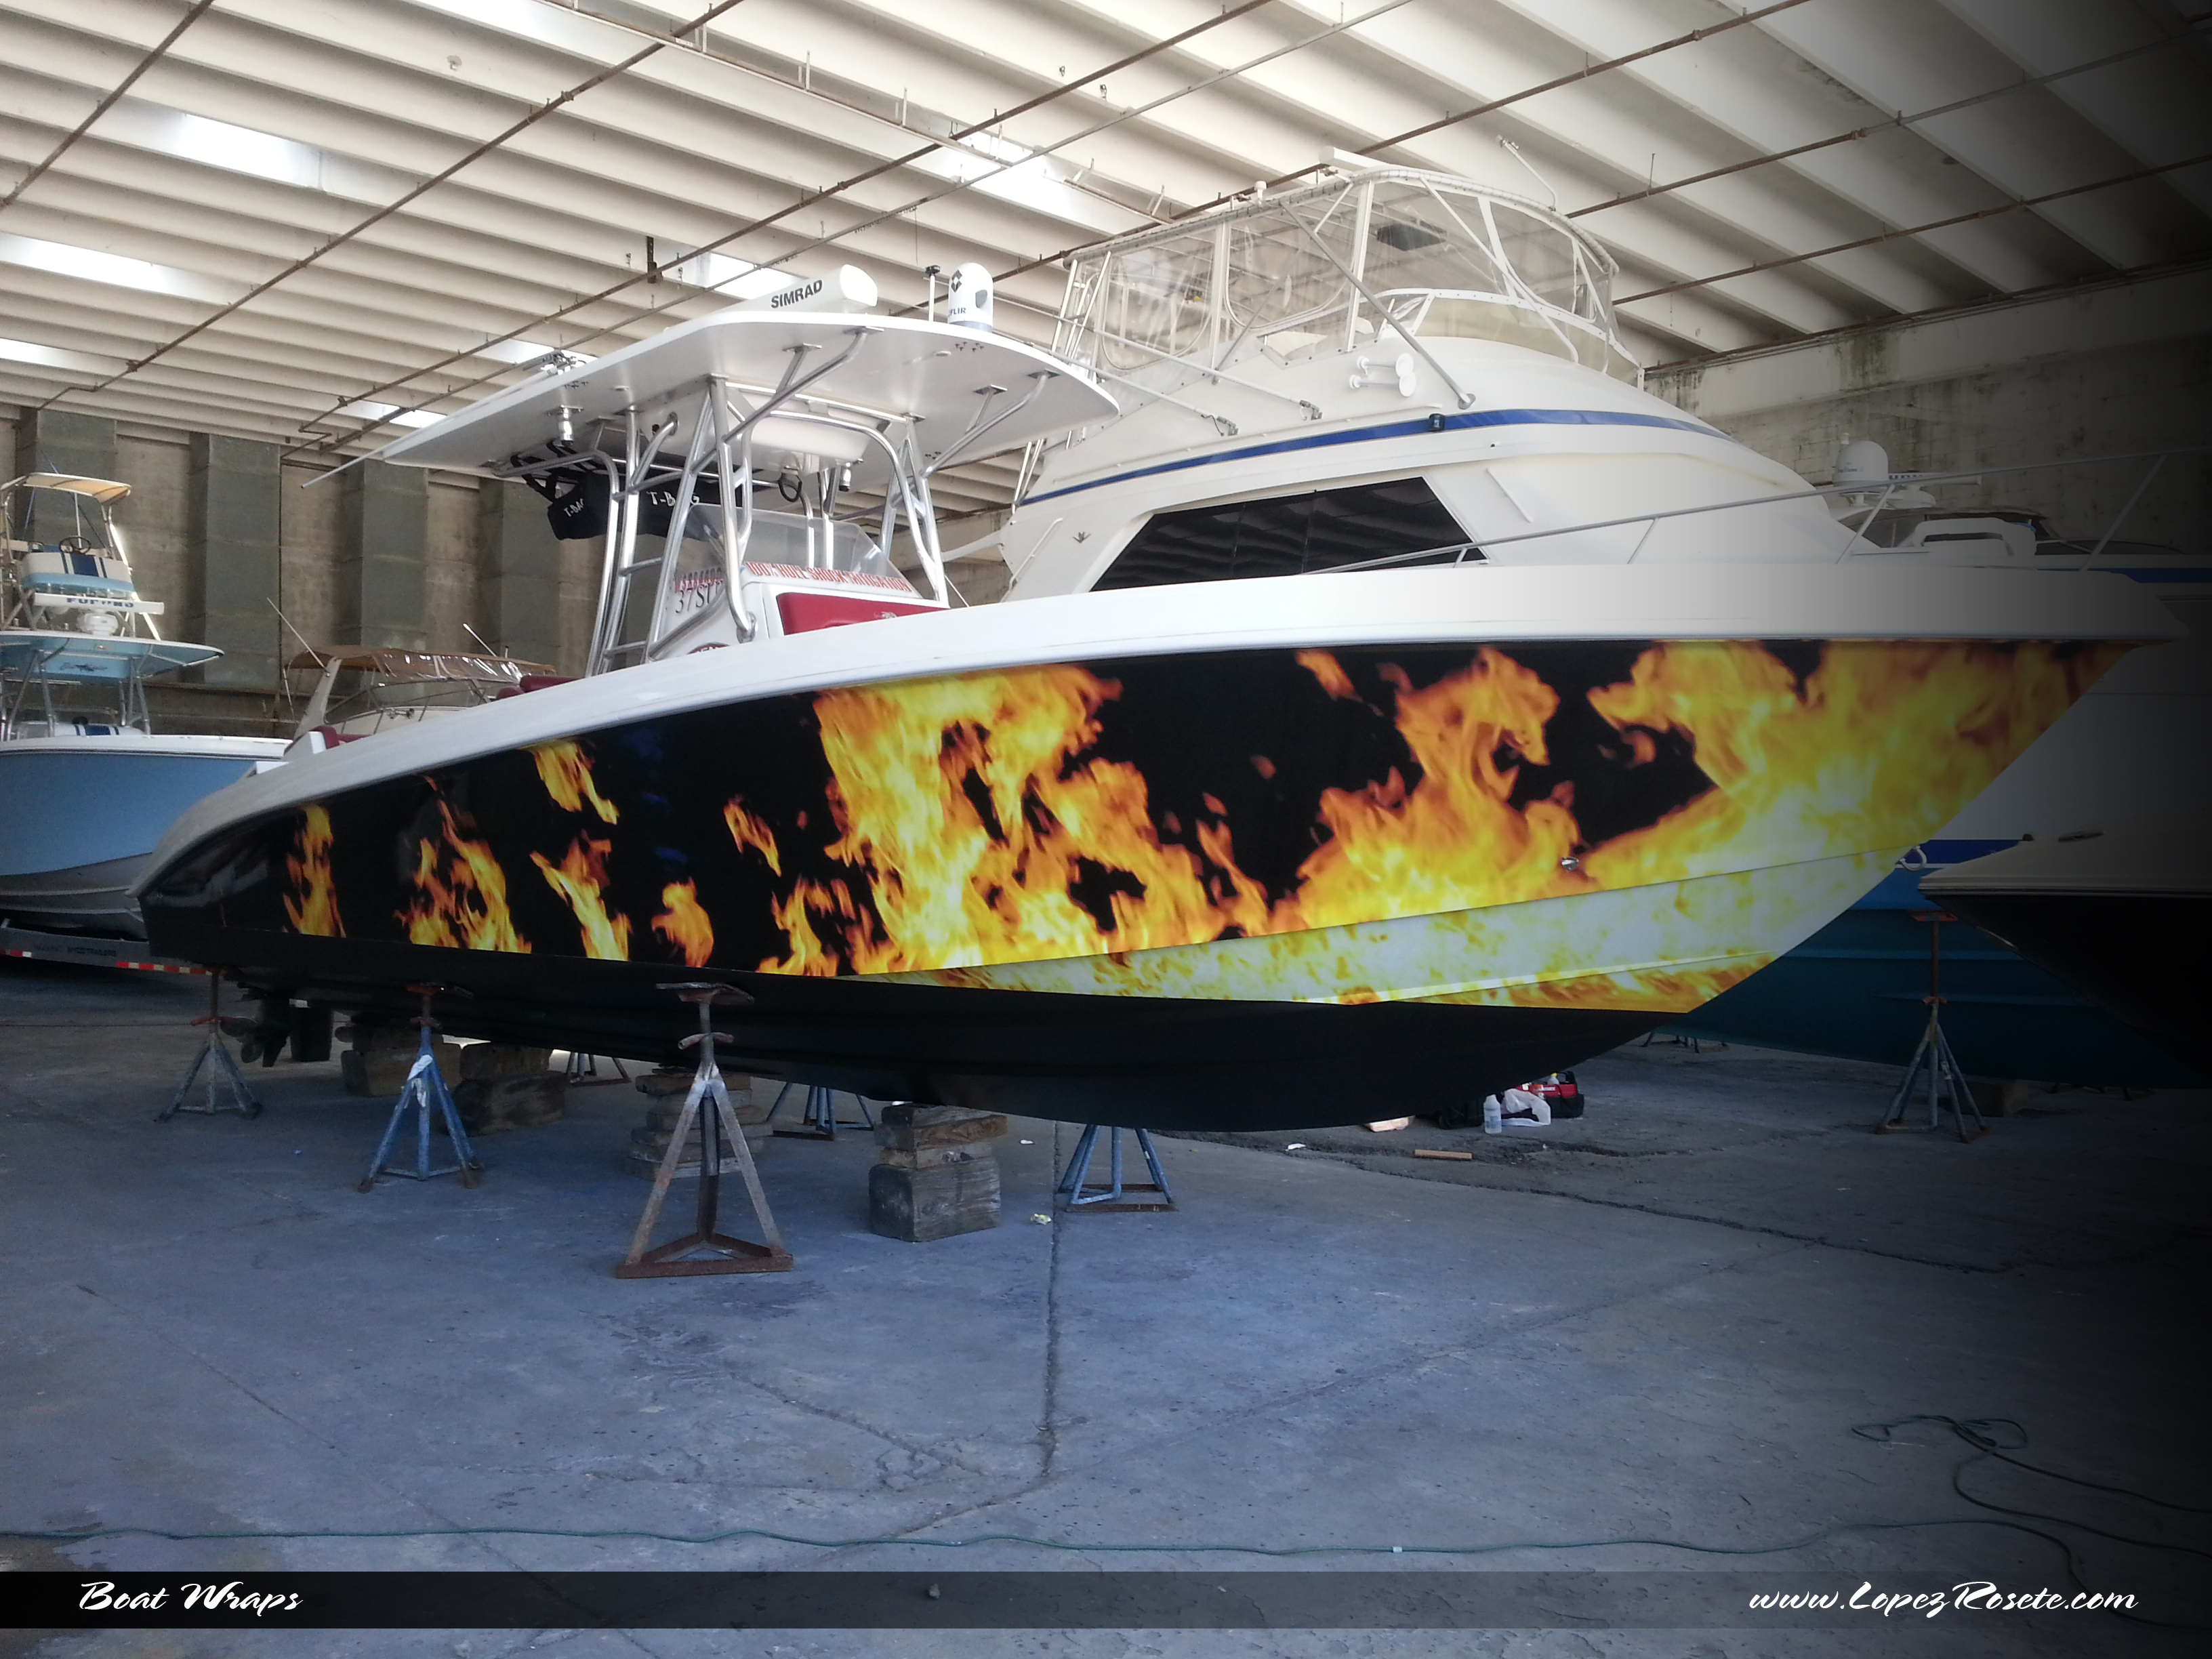 Boat_Flames